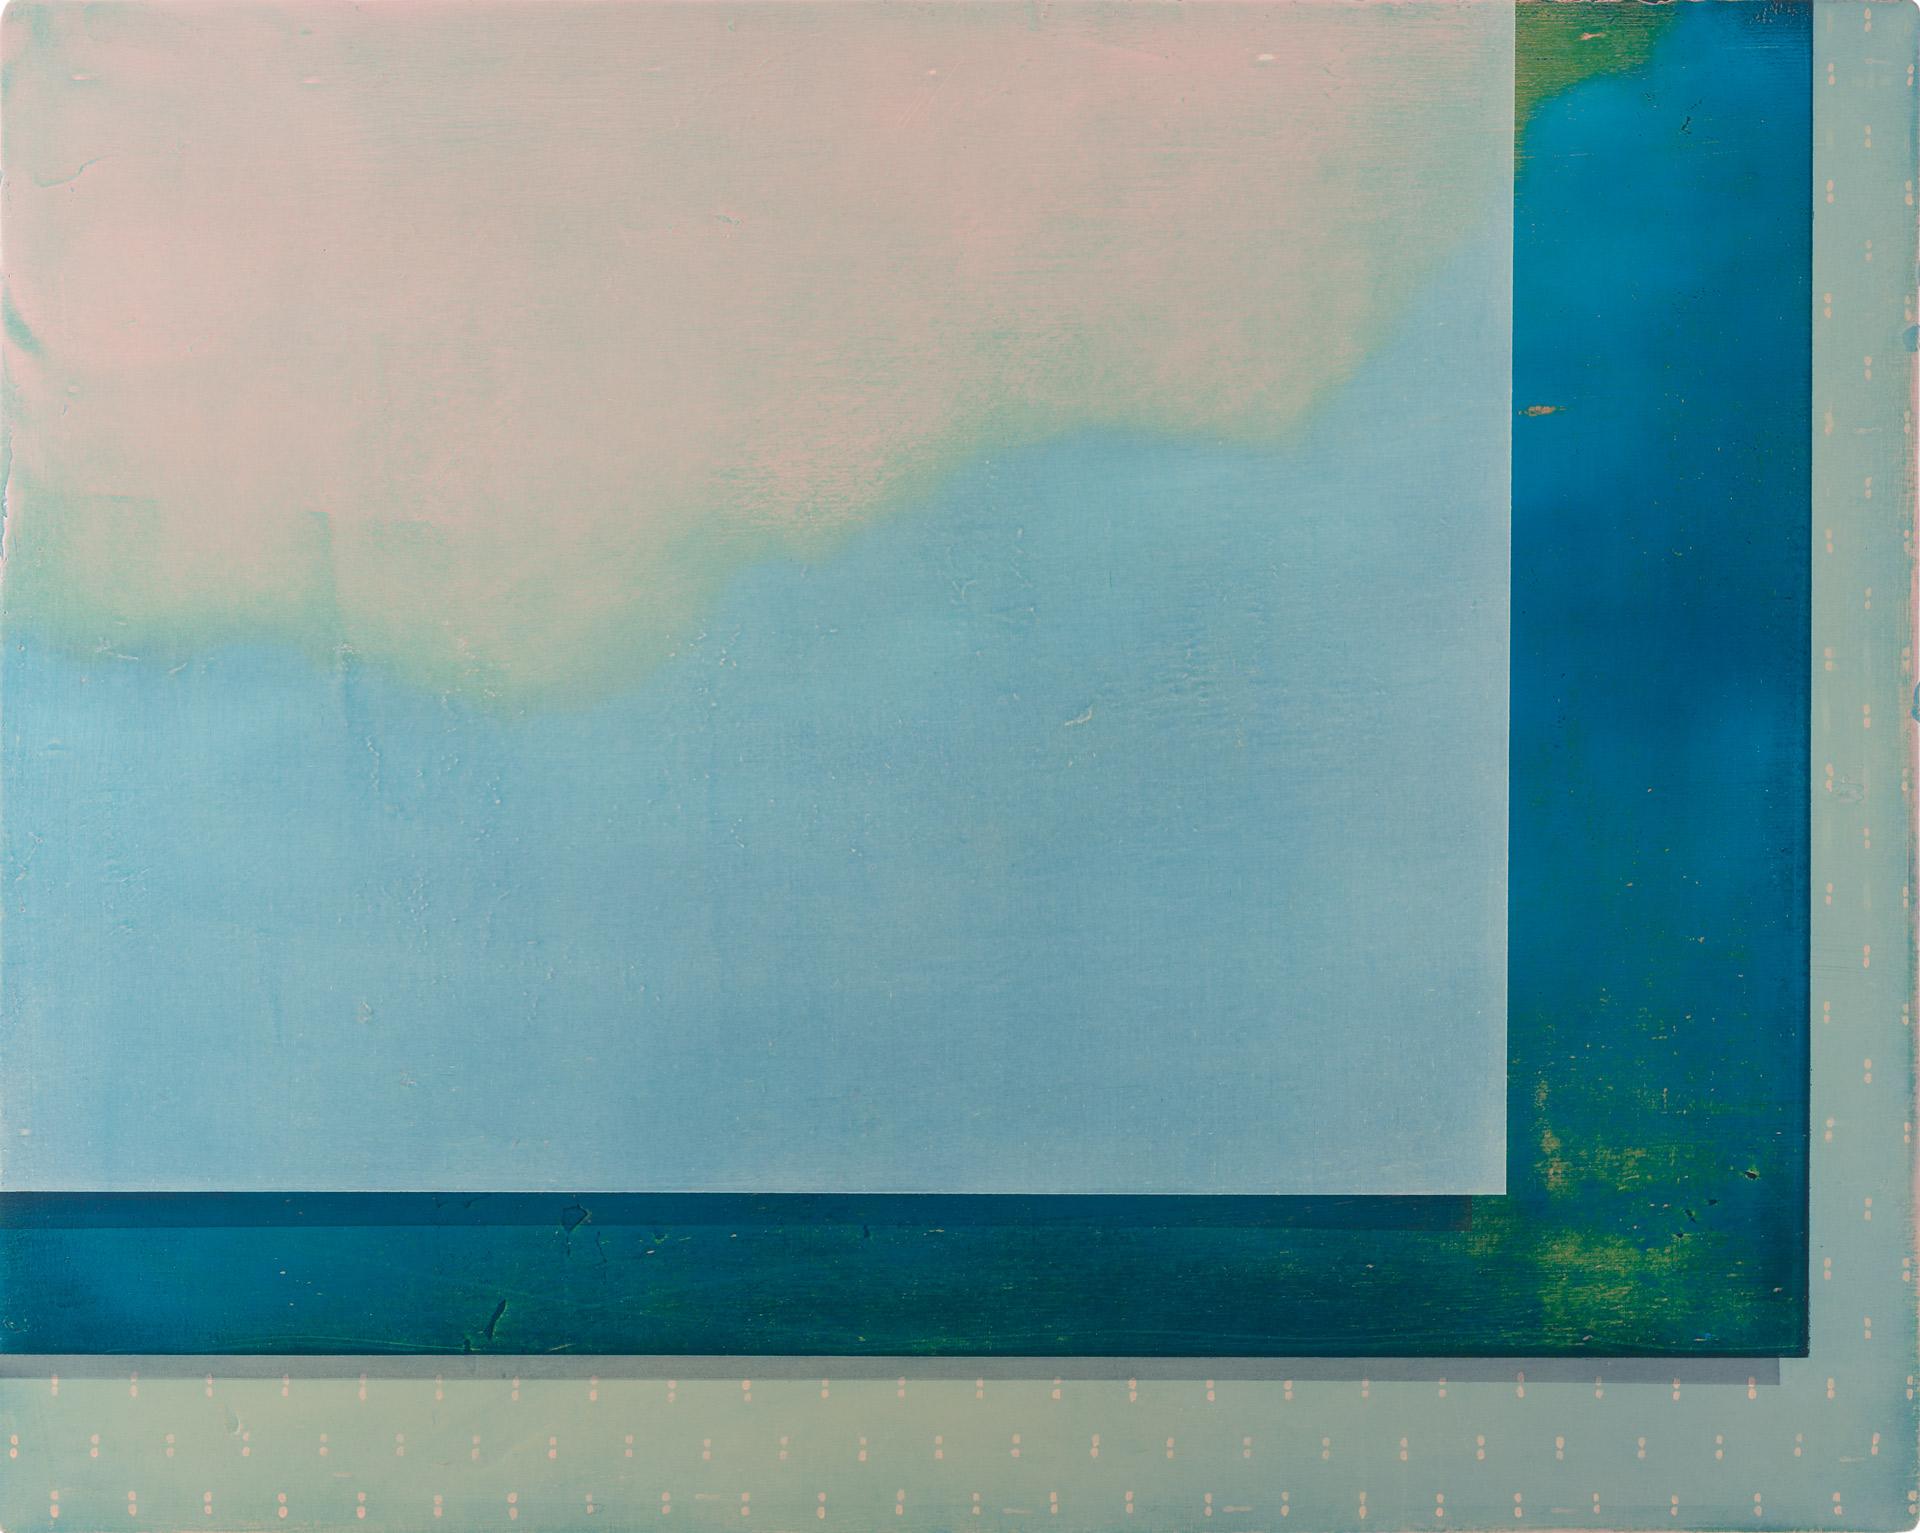 Untitled/40 x 50 cm, Oil on wood/2019